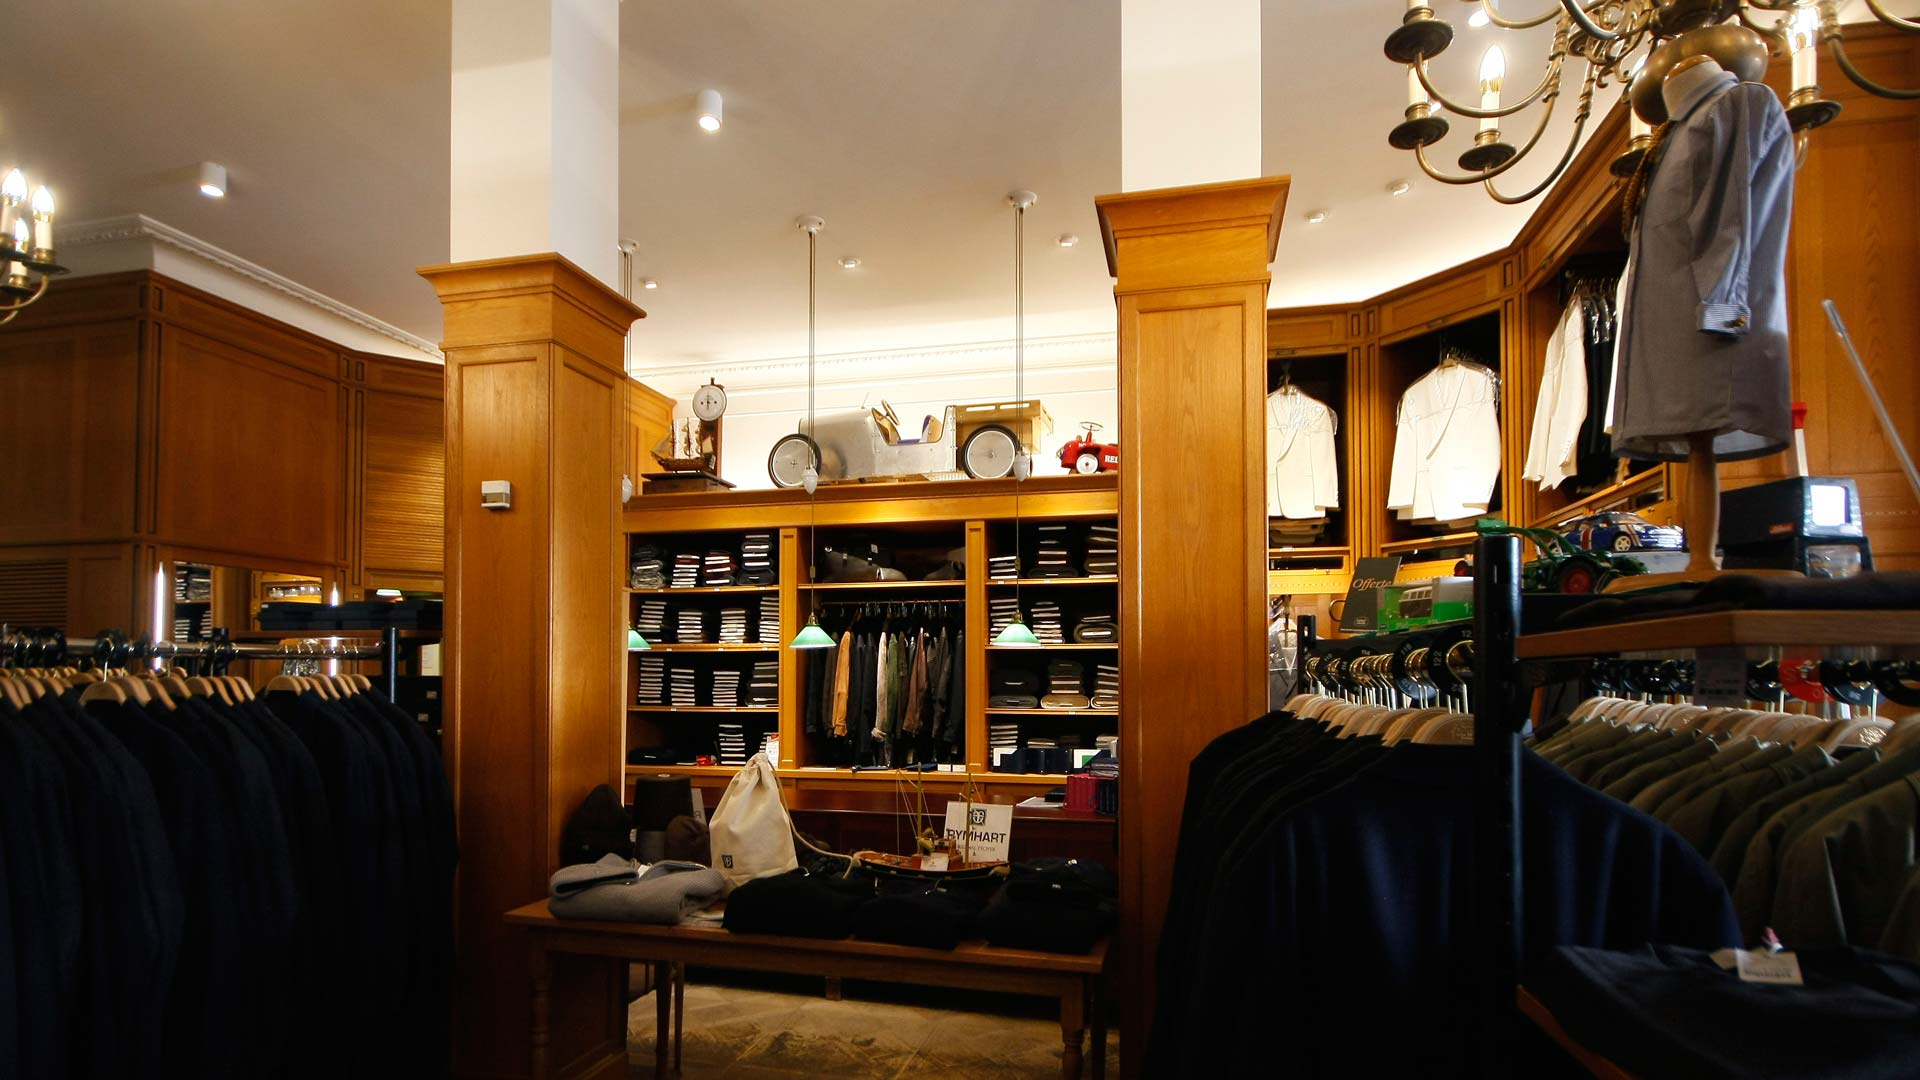 MAASS-Lichtplanung_Shopbeleuchtung eines Traditionsunternehmens in Hamburg__MAASS-Shop-Ladage-Oelke-009